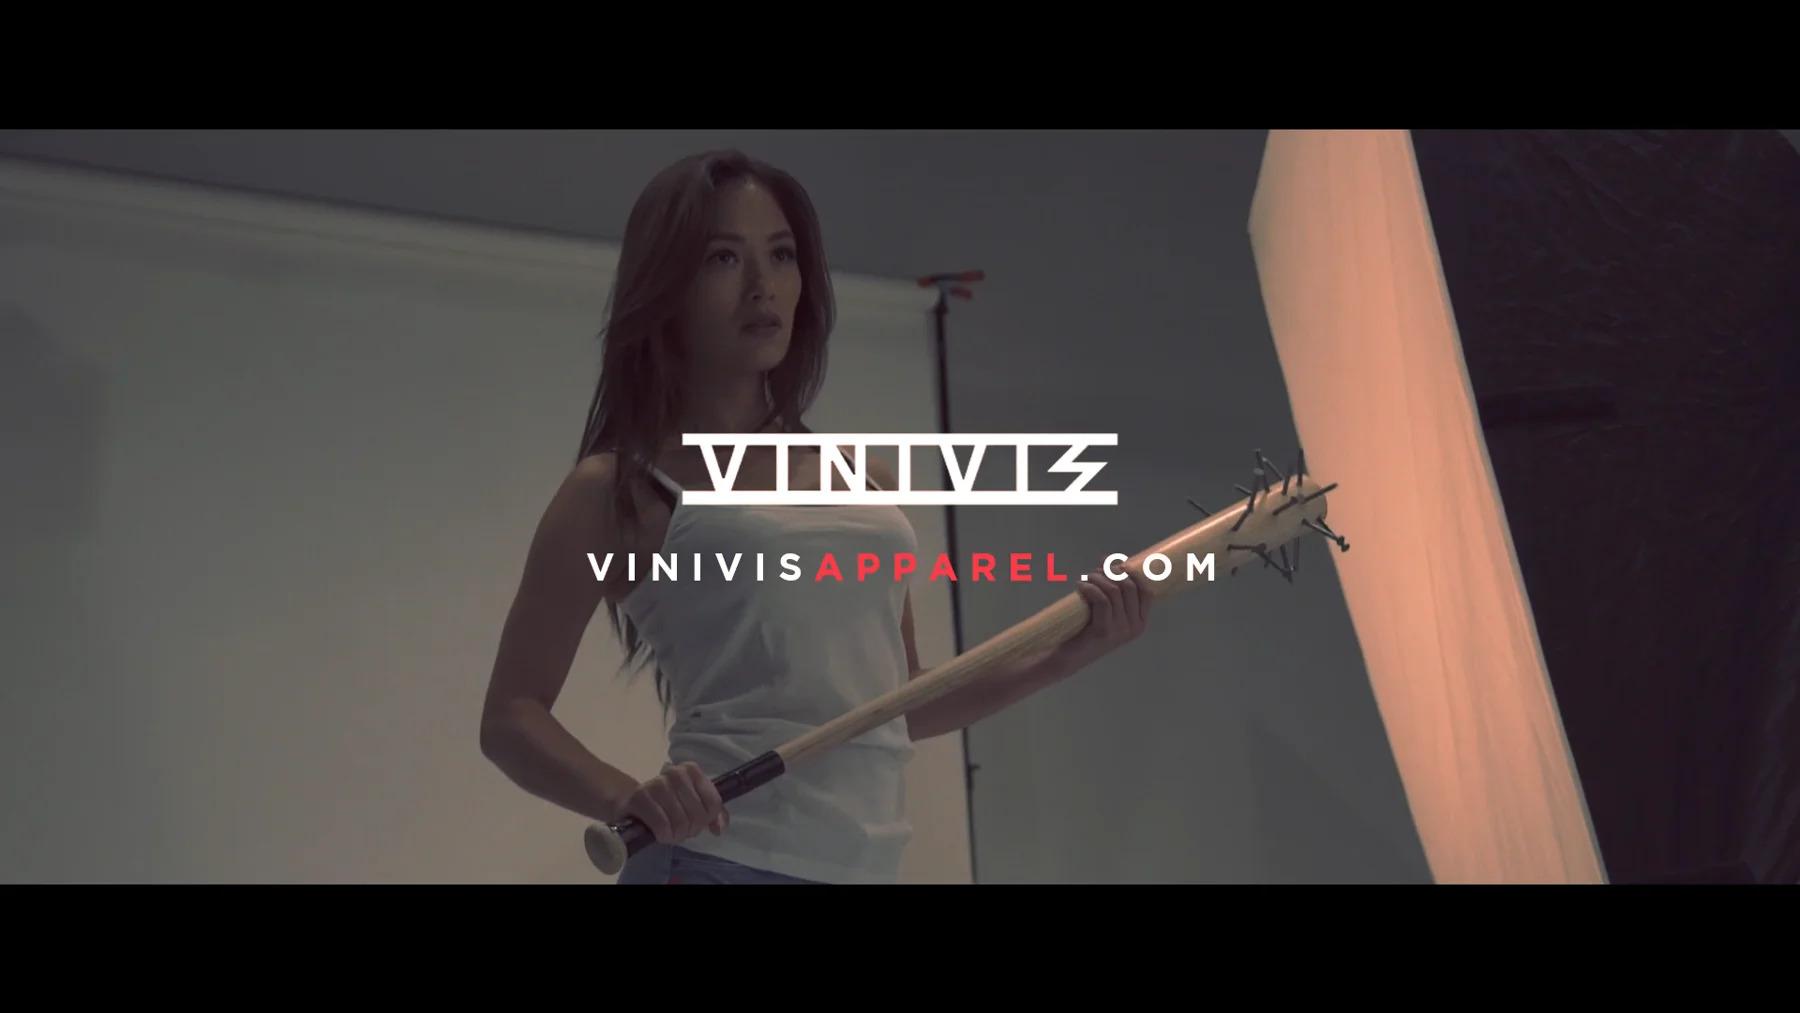 Behind-the-Scenes Teaser for Vinivis Apparel